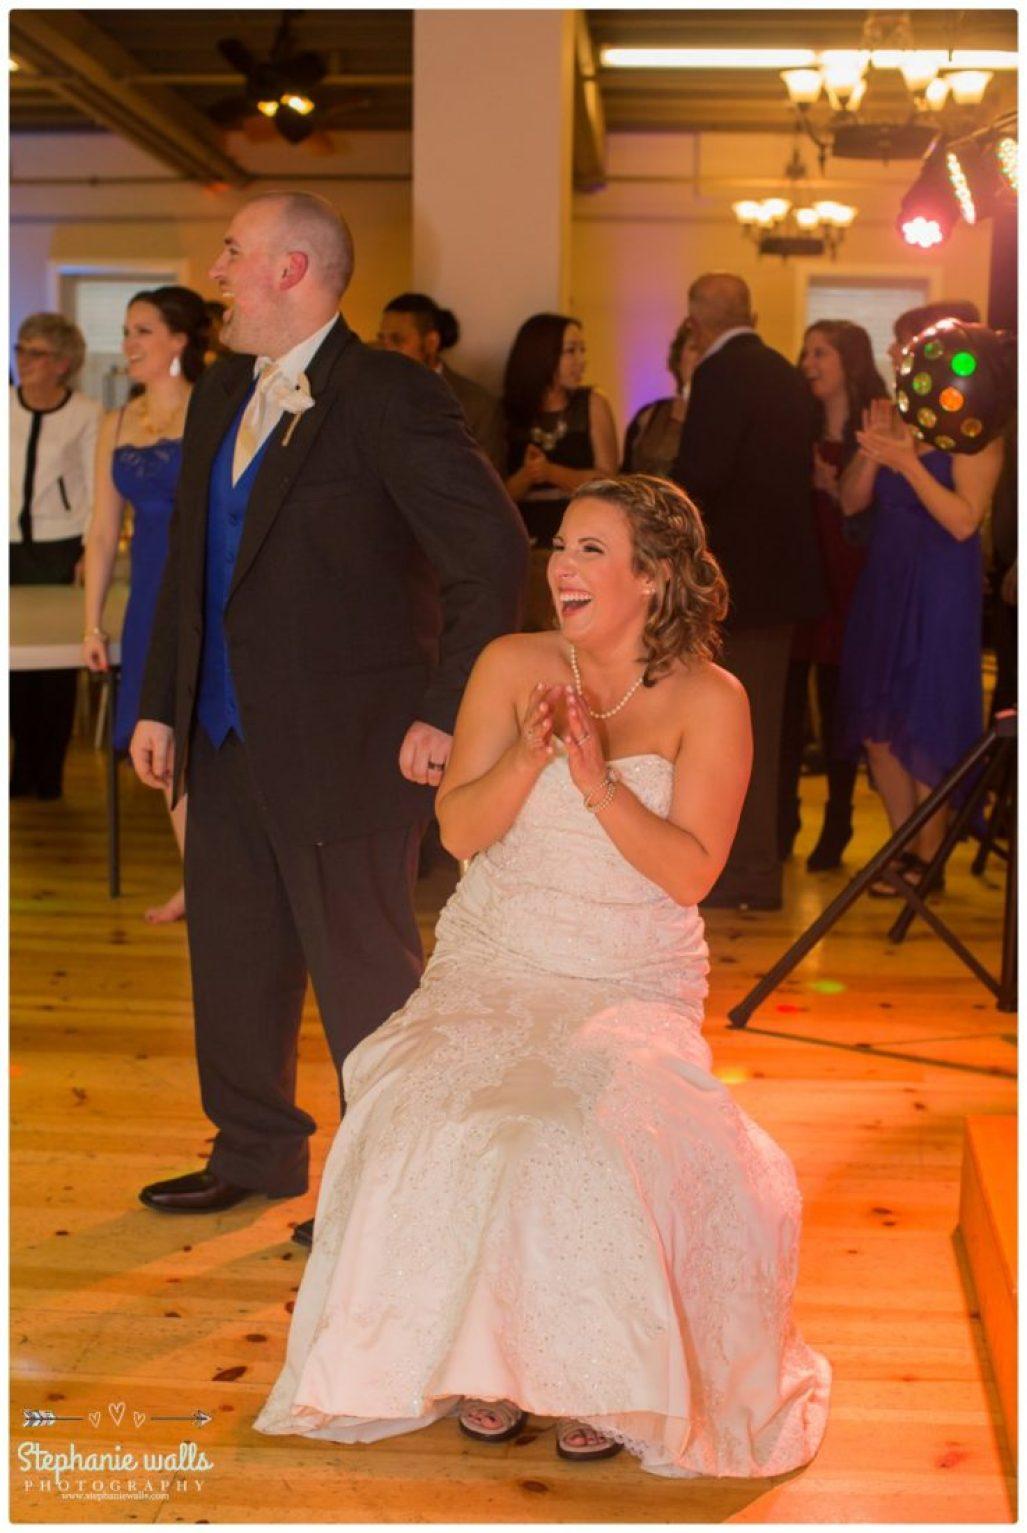 2016 03 24 0031 Racing Love   Snohomish Event Center   Snohomish Wedding Photographer